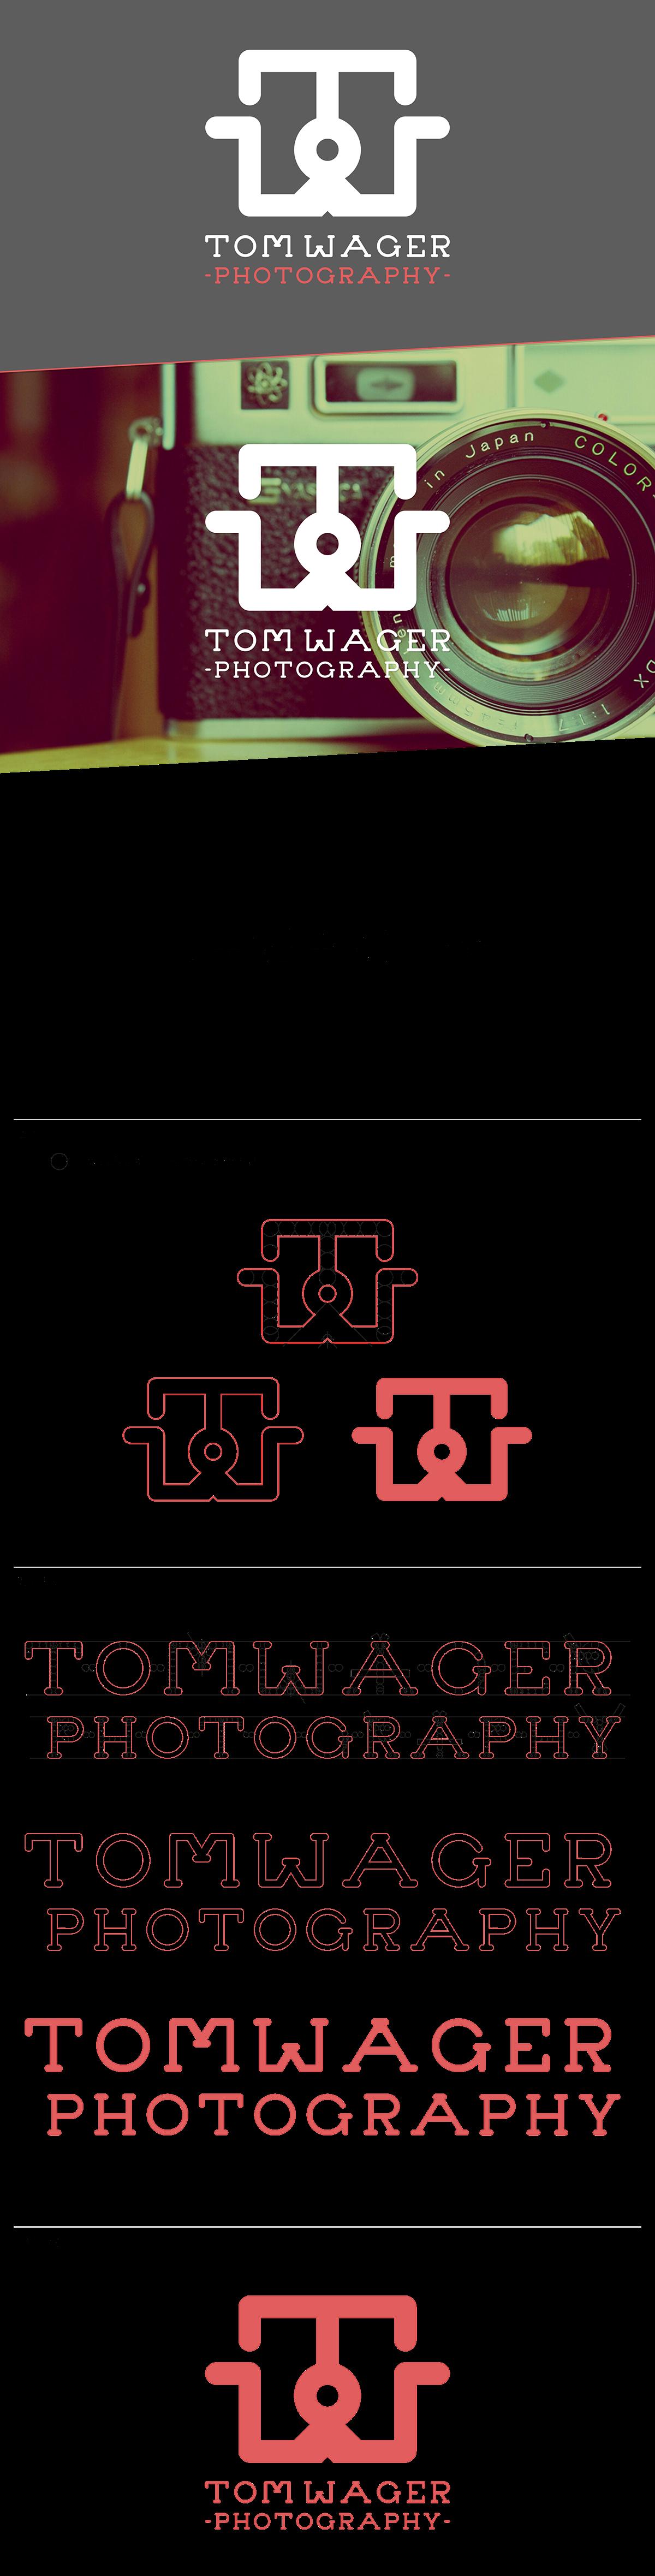 Logo Design camera logo camera icon type Typeface